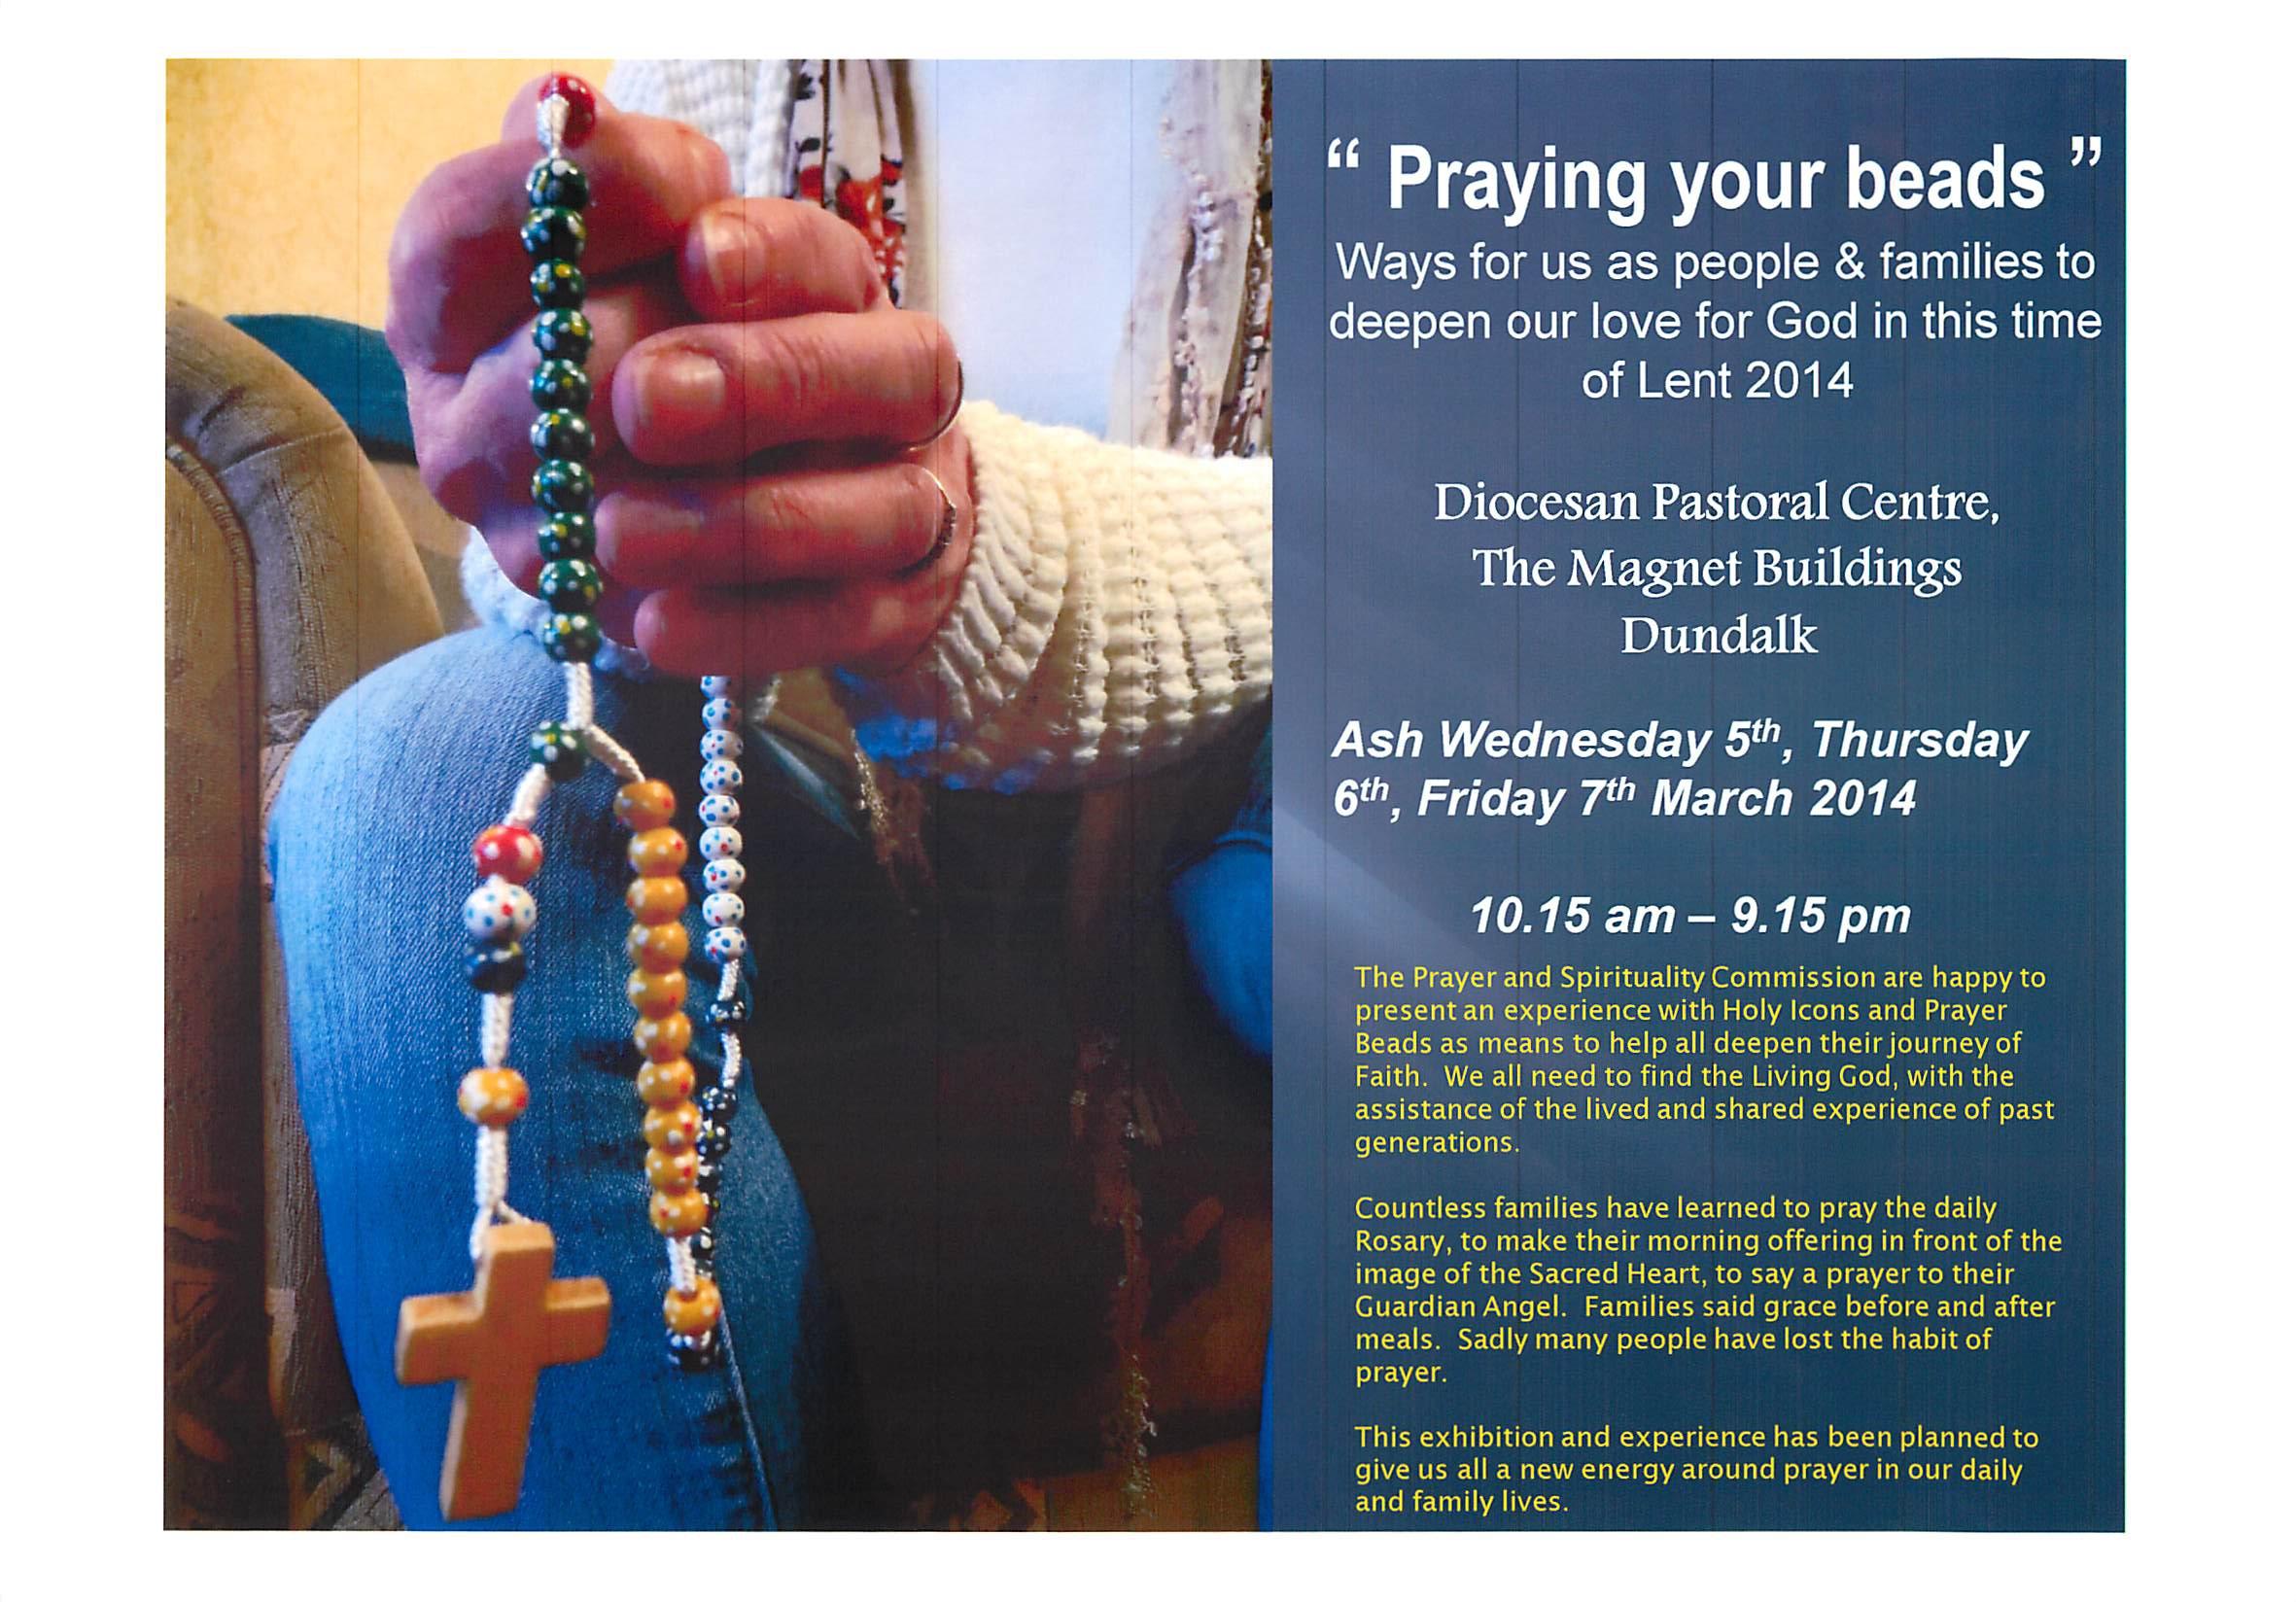 Praying_Your_Beads_Lent2014